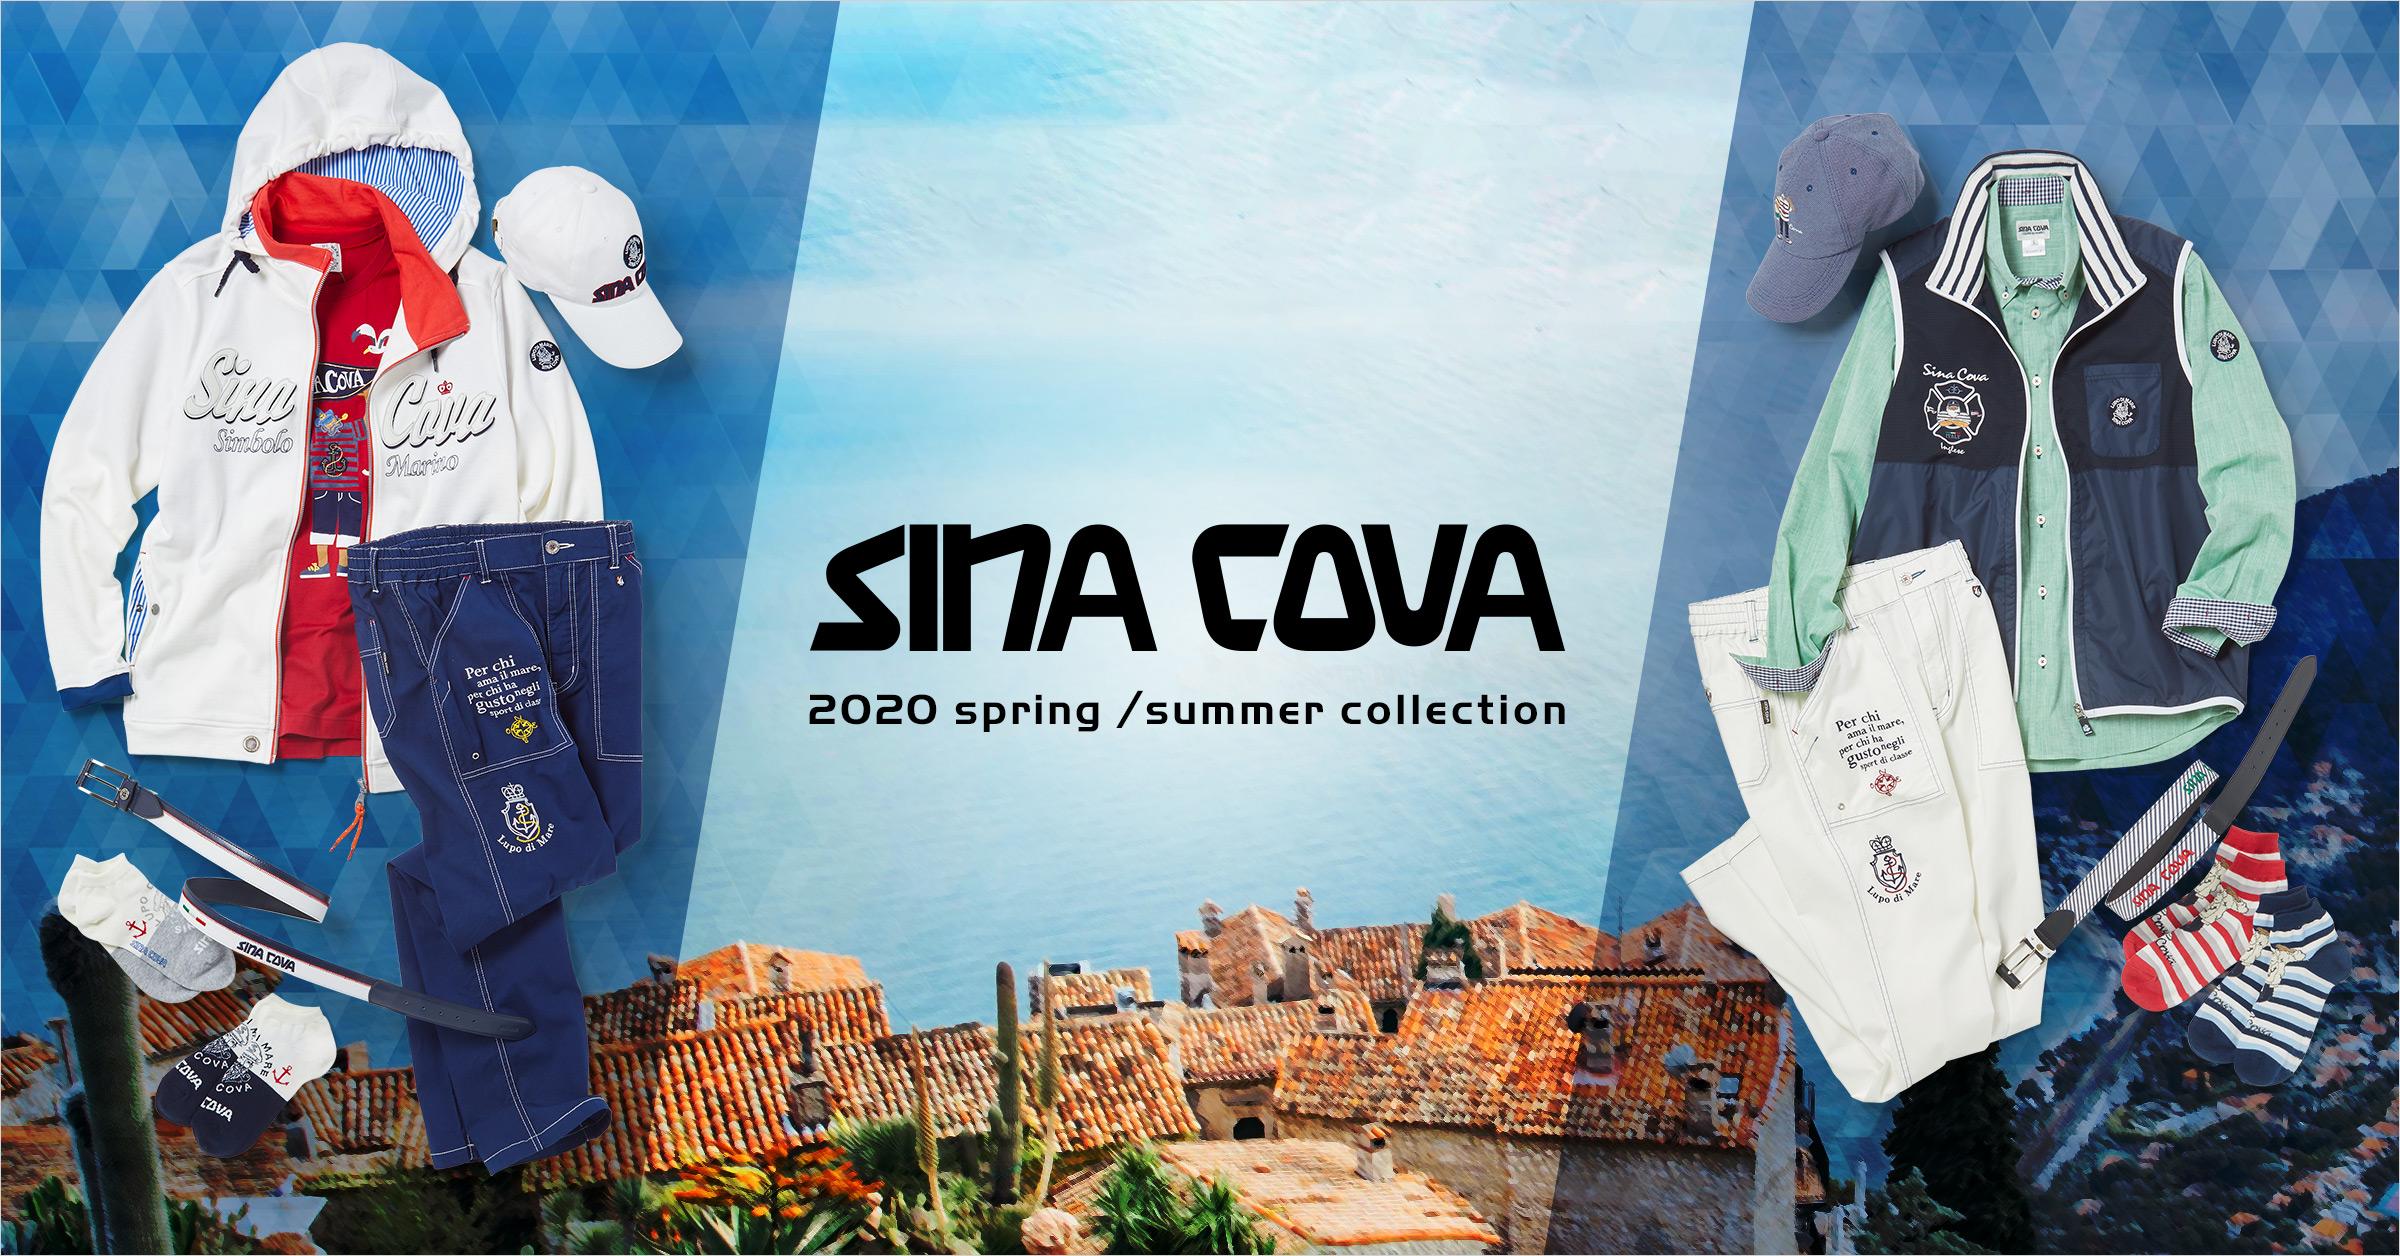 2020 Spring/Summer collection SINACOVA